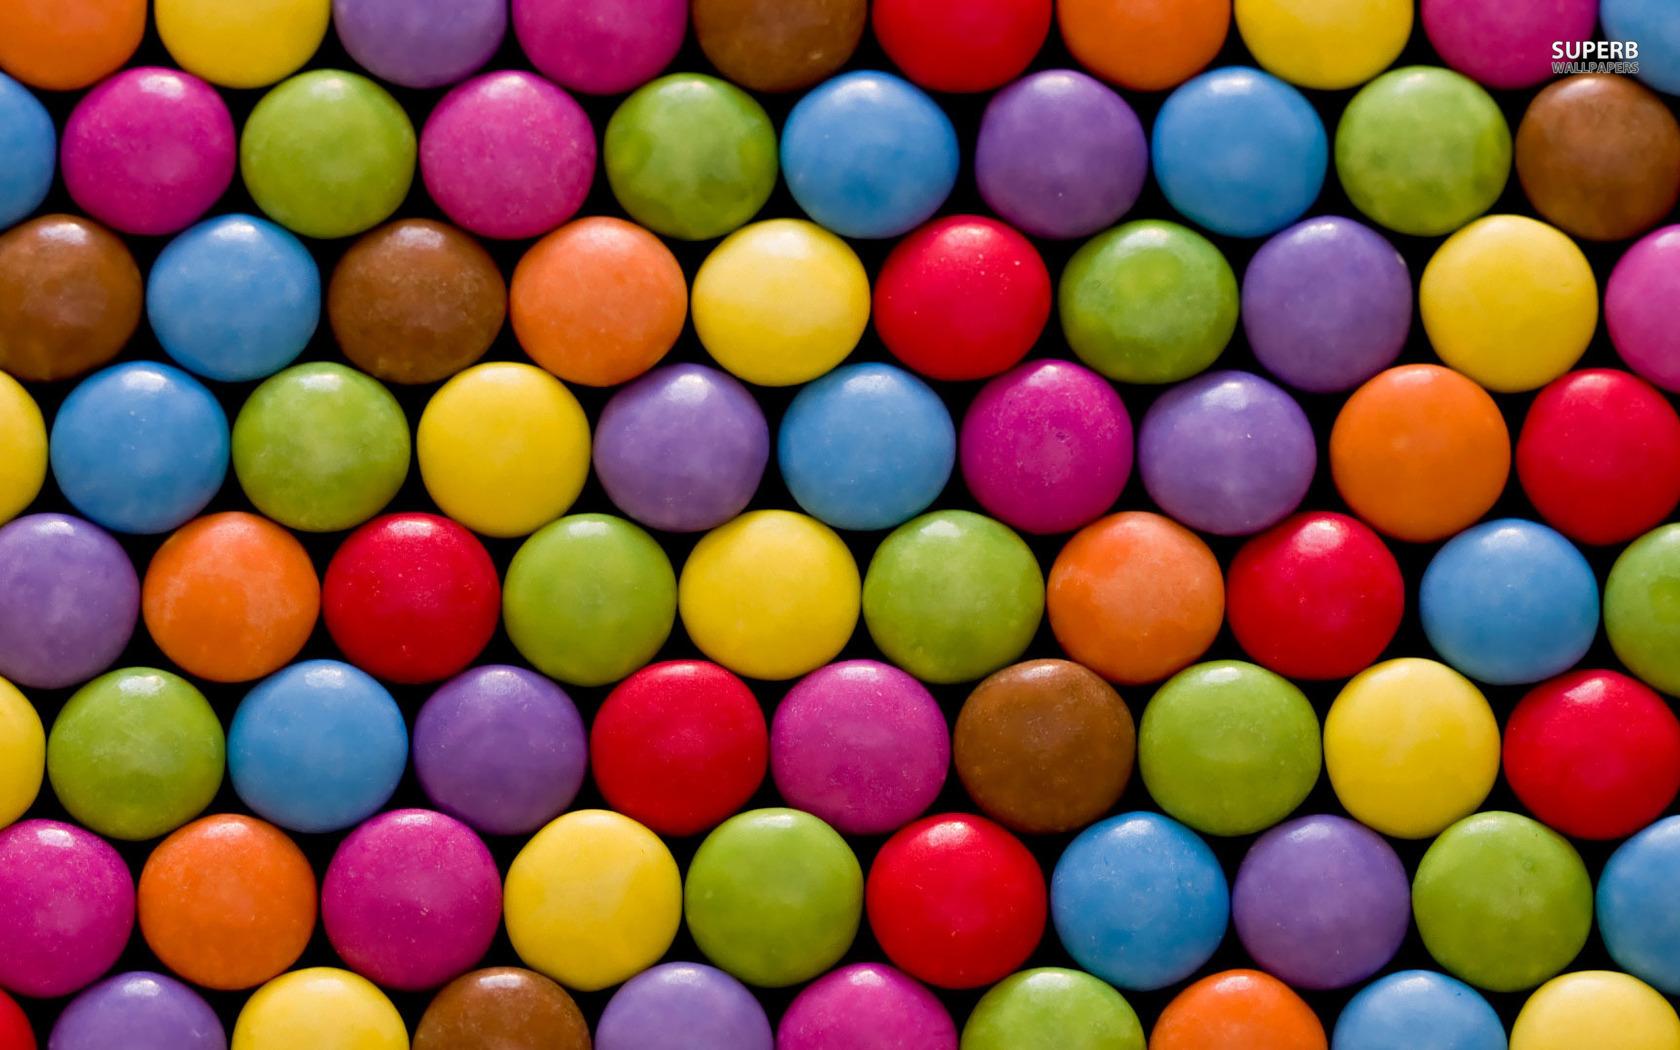 Candy Wallpaper Desktop 10 Background Wallpaper   Hivewallpapercom 1680x1050